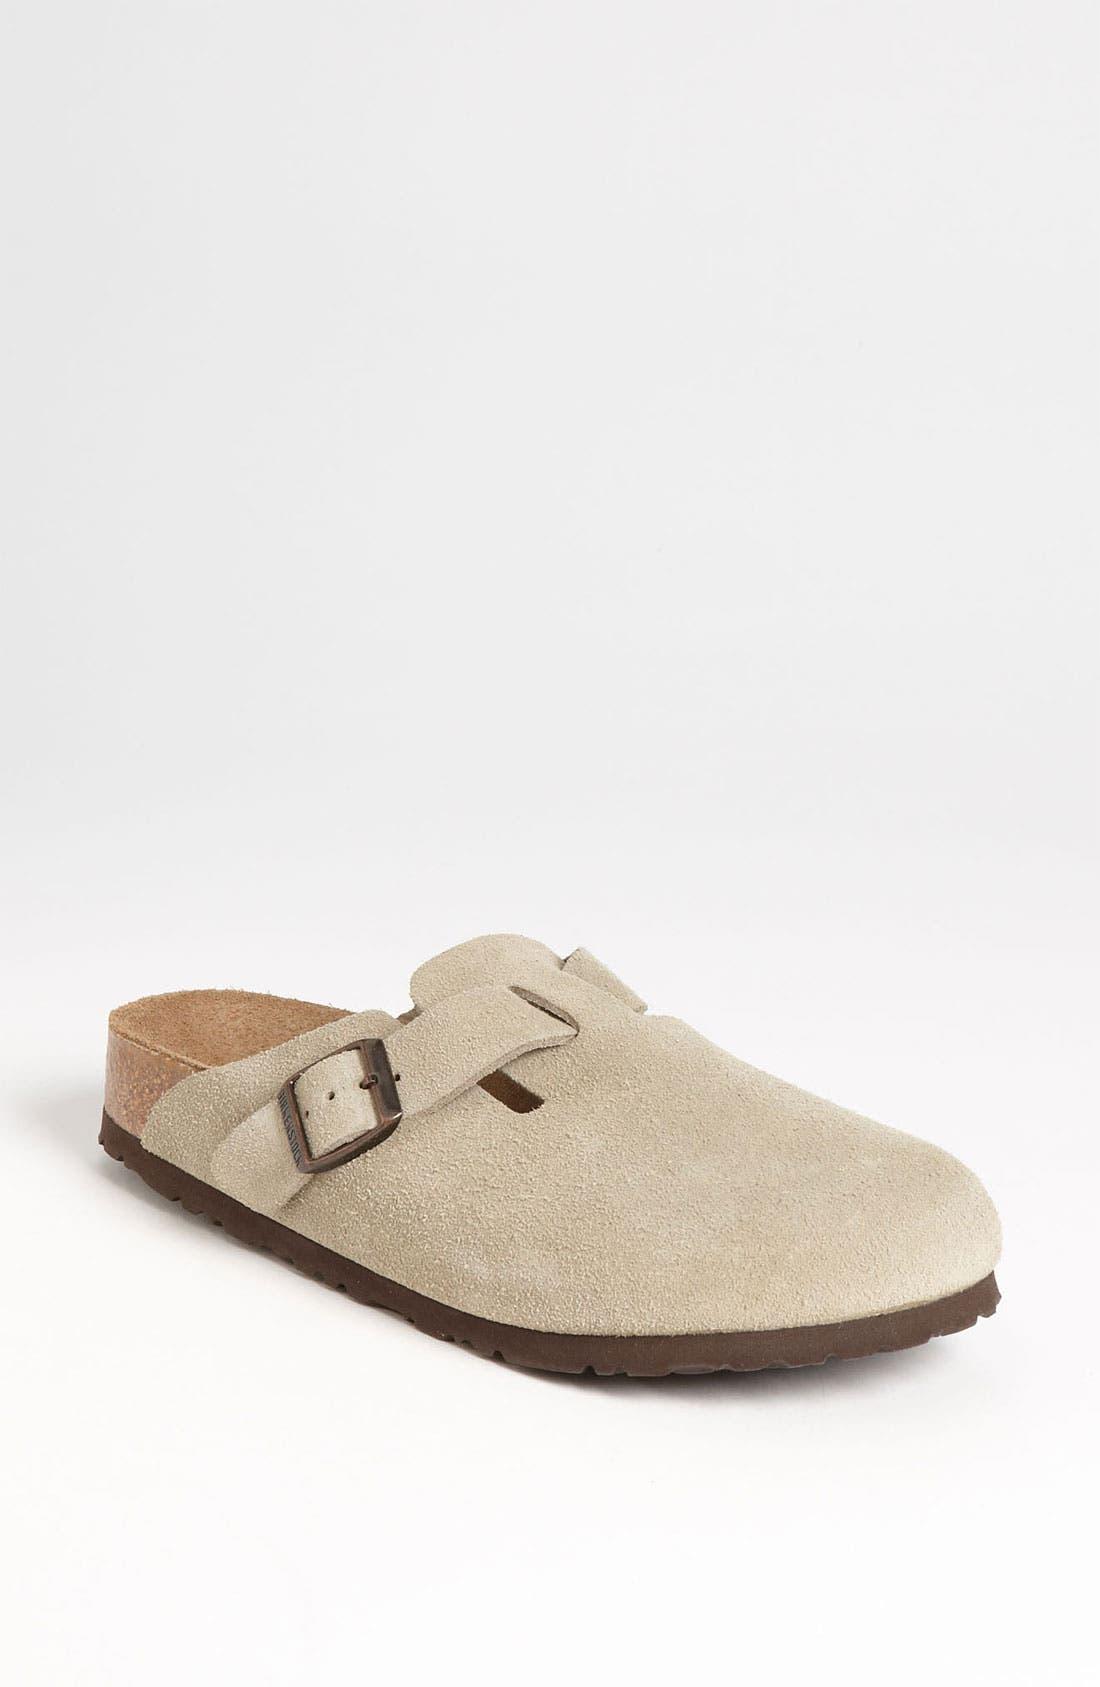 Alternate Image 1 Selected - Birkenstock 'Boston' Soft Footbed Clog (Women)